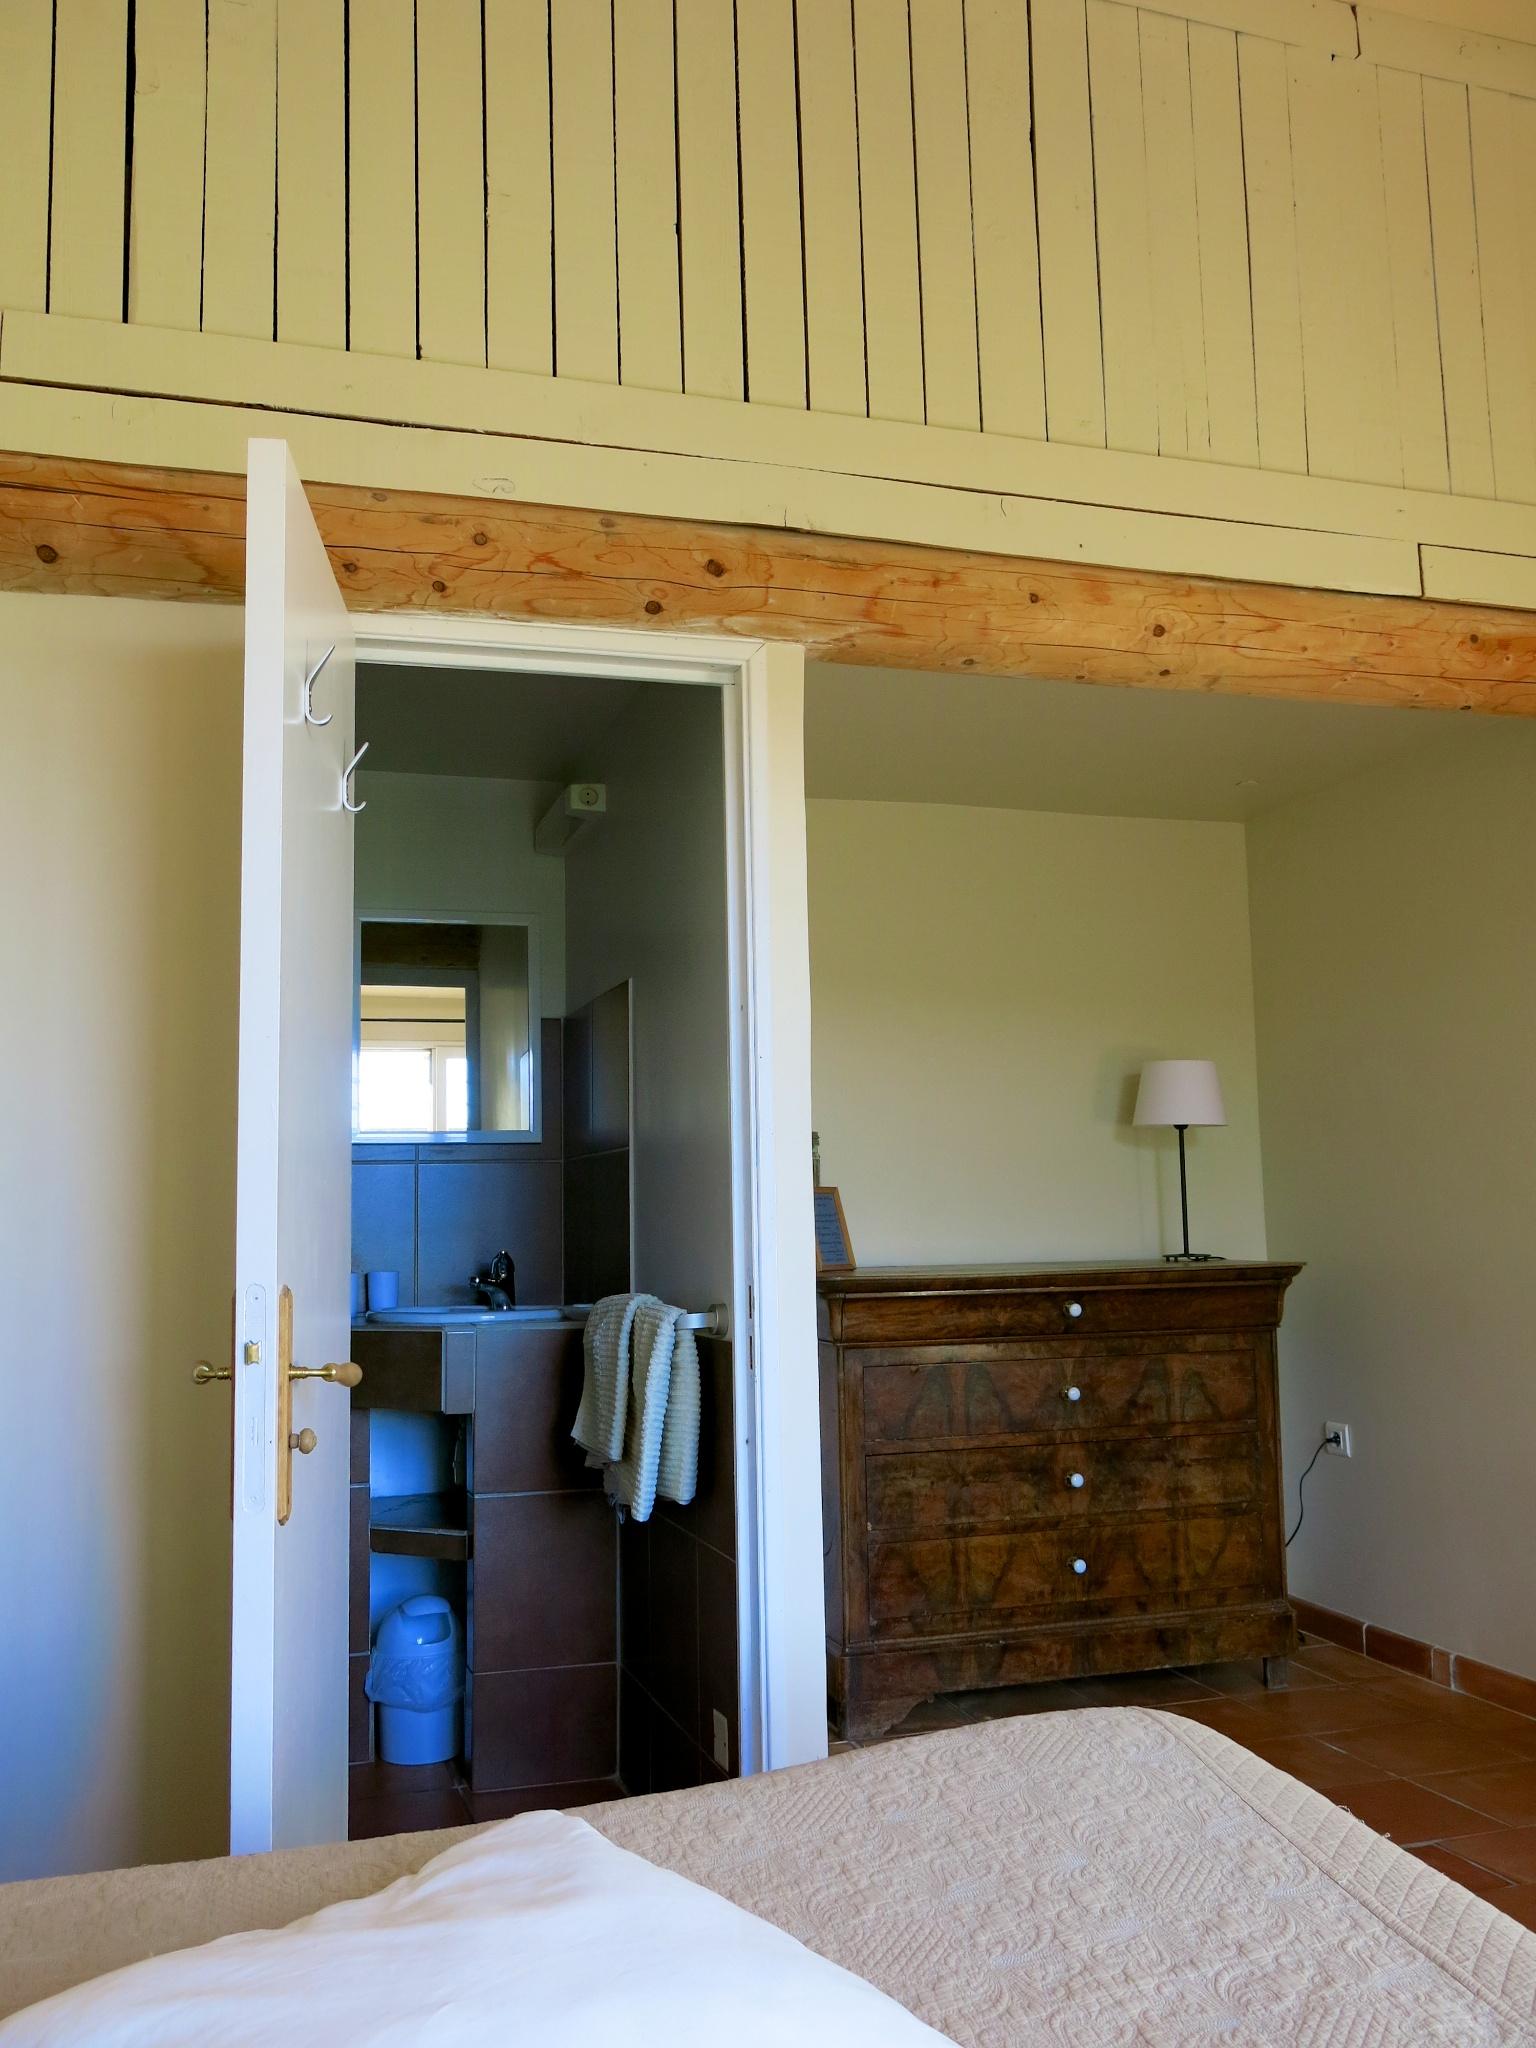 Les oliviers chambres dhotes moustiers sainte marie 002 - Chambre d hote moustiers sainte marie ...